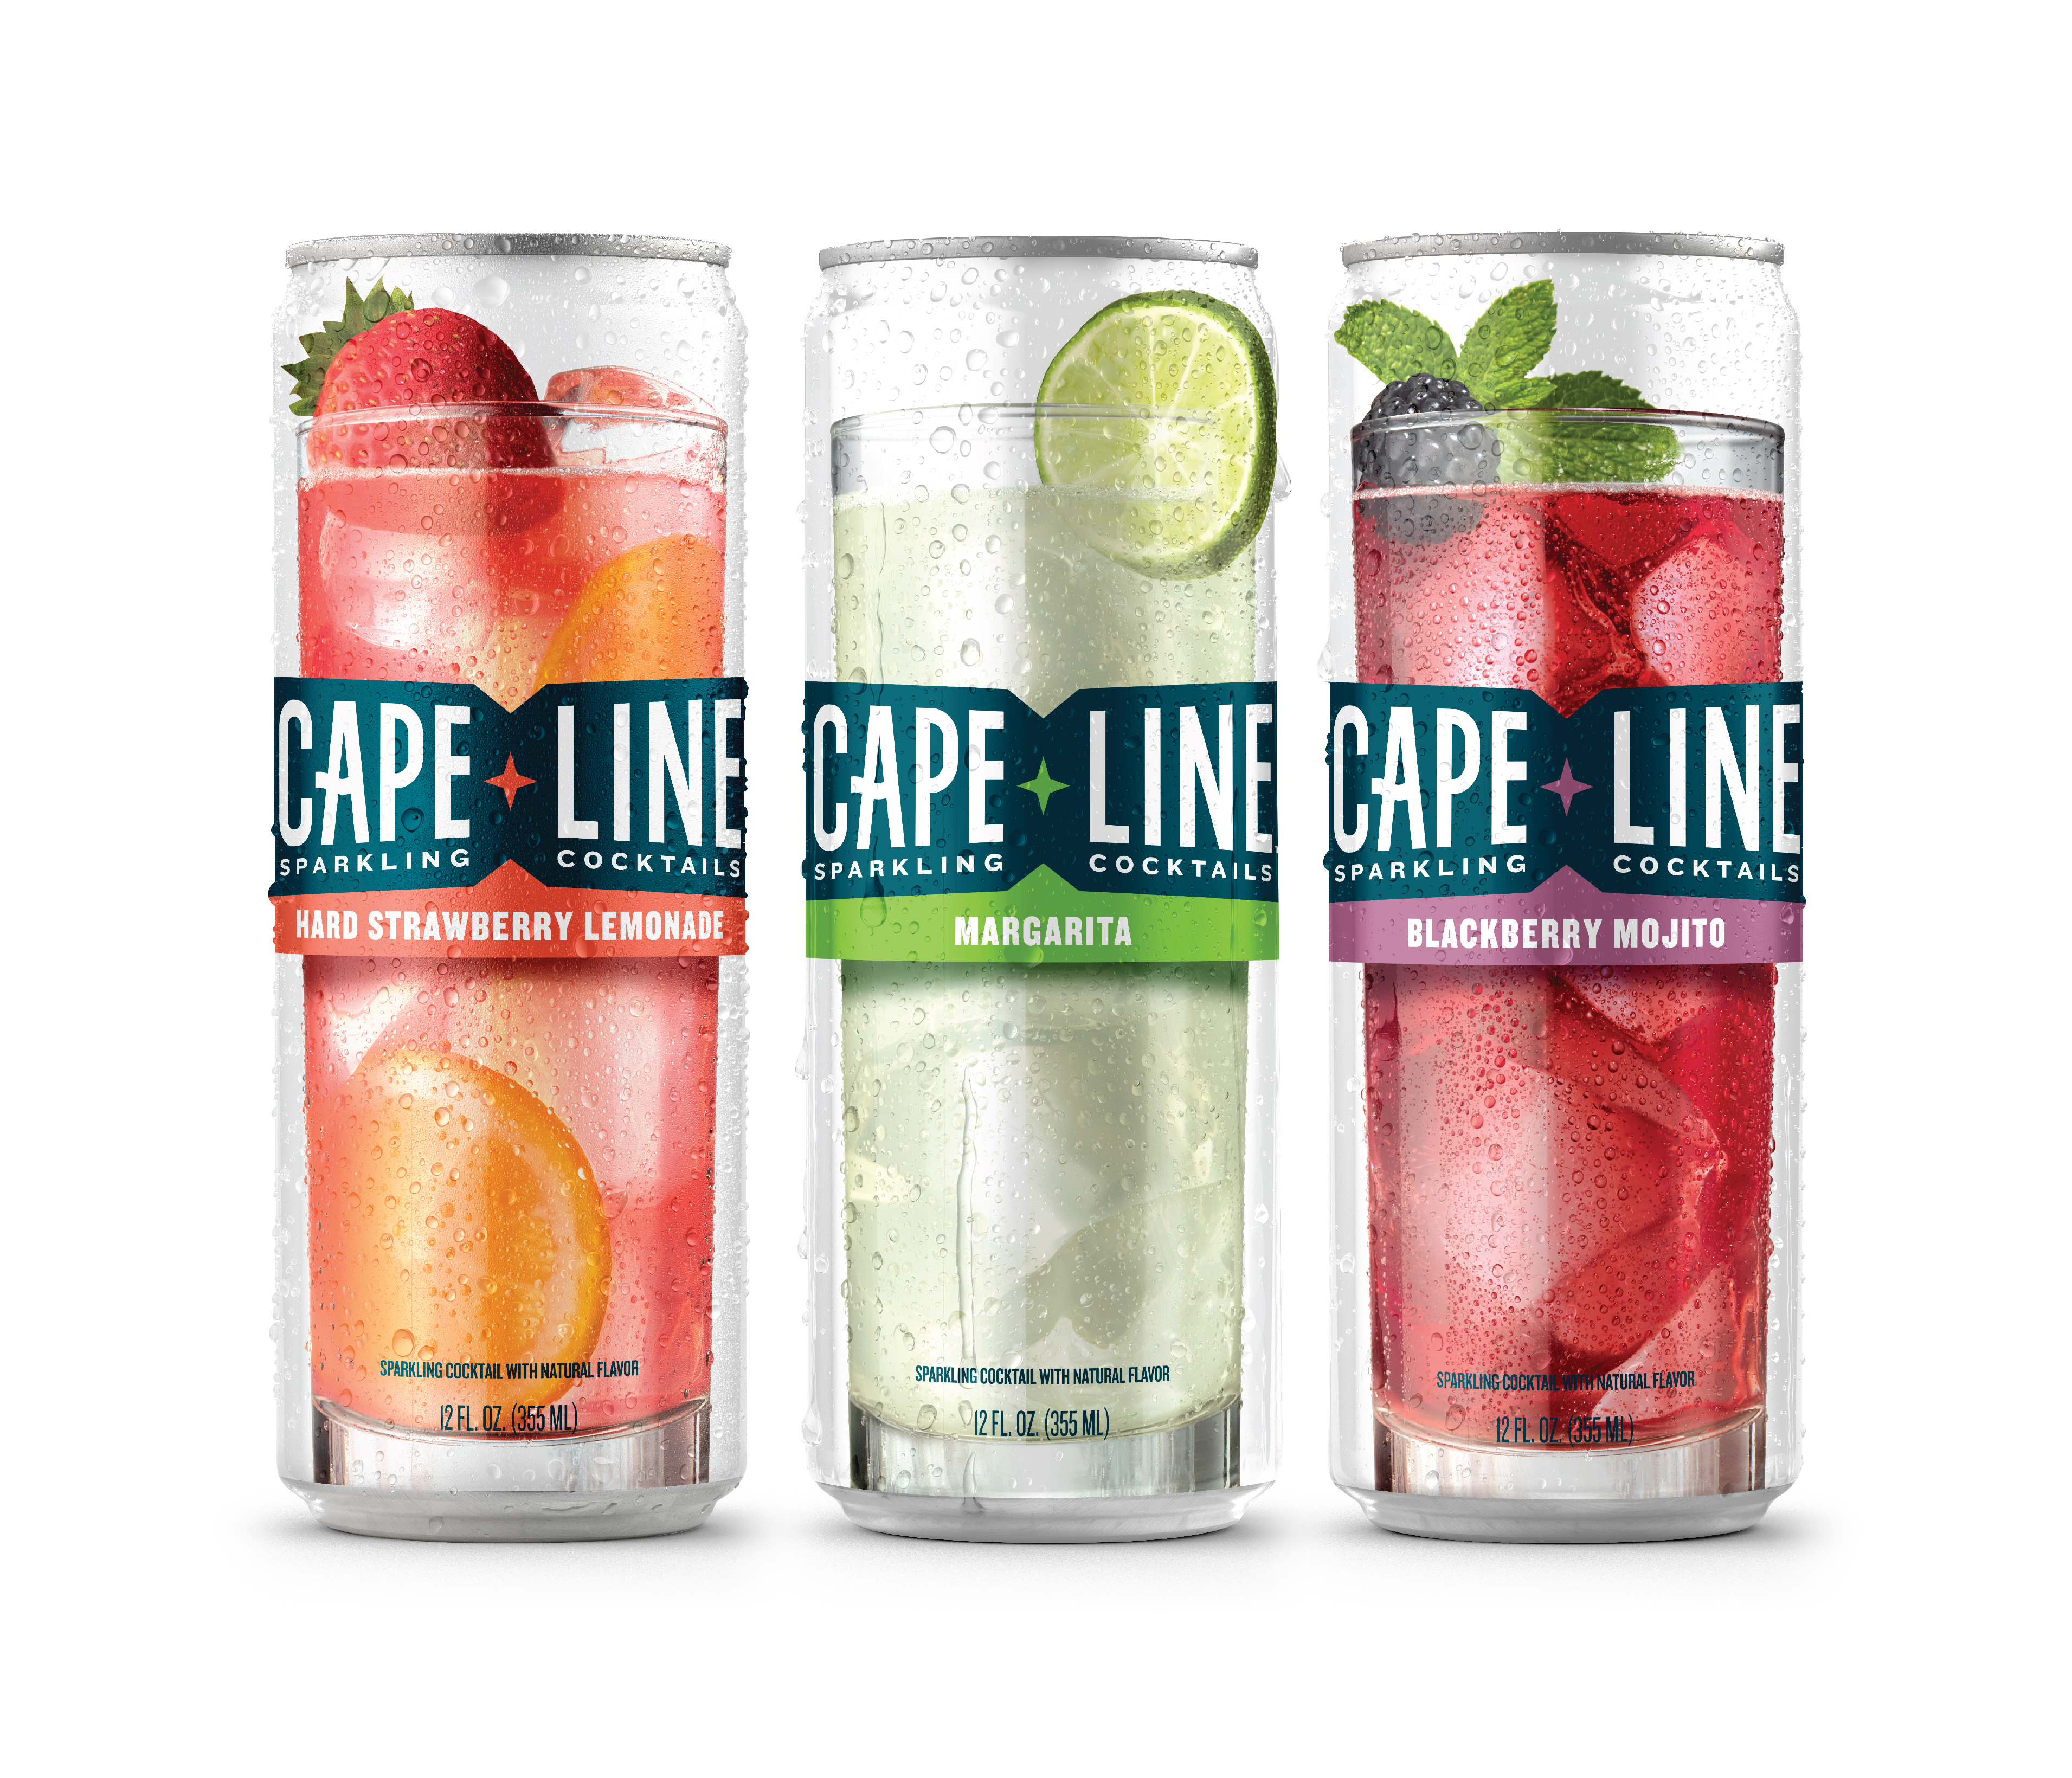 Cape Line, a new line of sparkling cocktails, unveils first